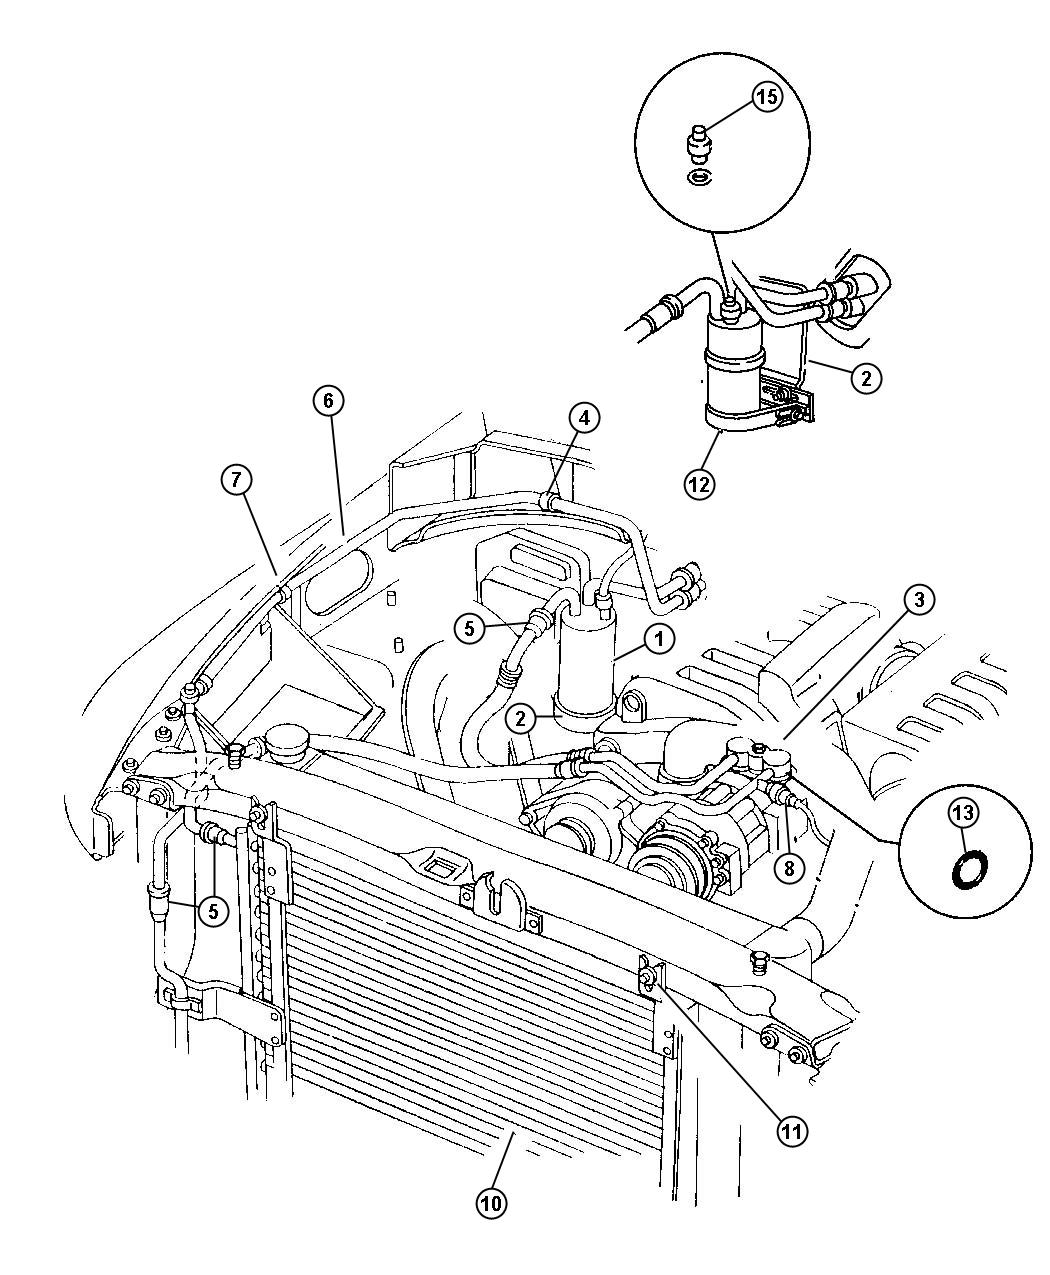 2001 dodge ram 1500 line a c liquid all vehicles with. Black Bedroom Furniture Sets. Home Design Ideas